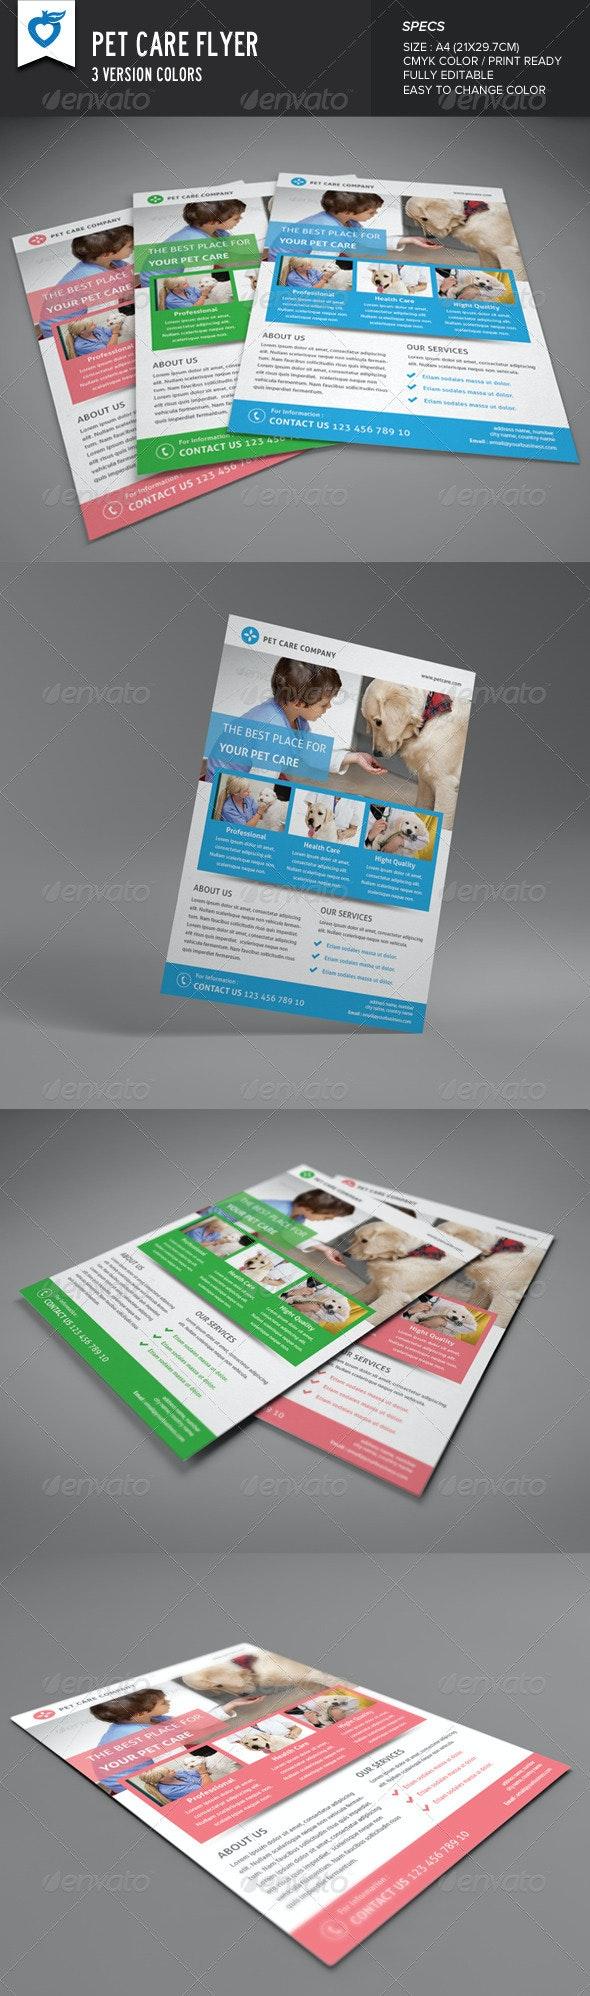 Pet Care Flyer - Corporate Flyers